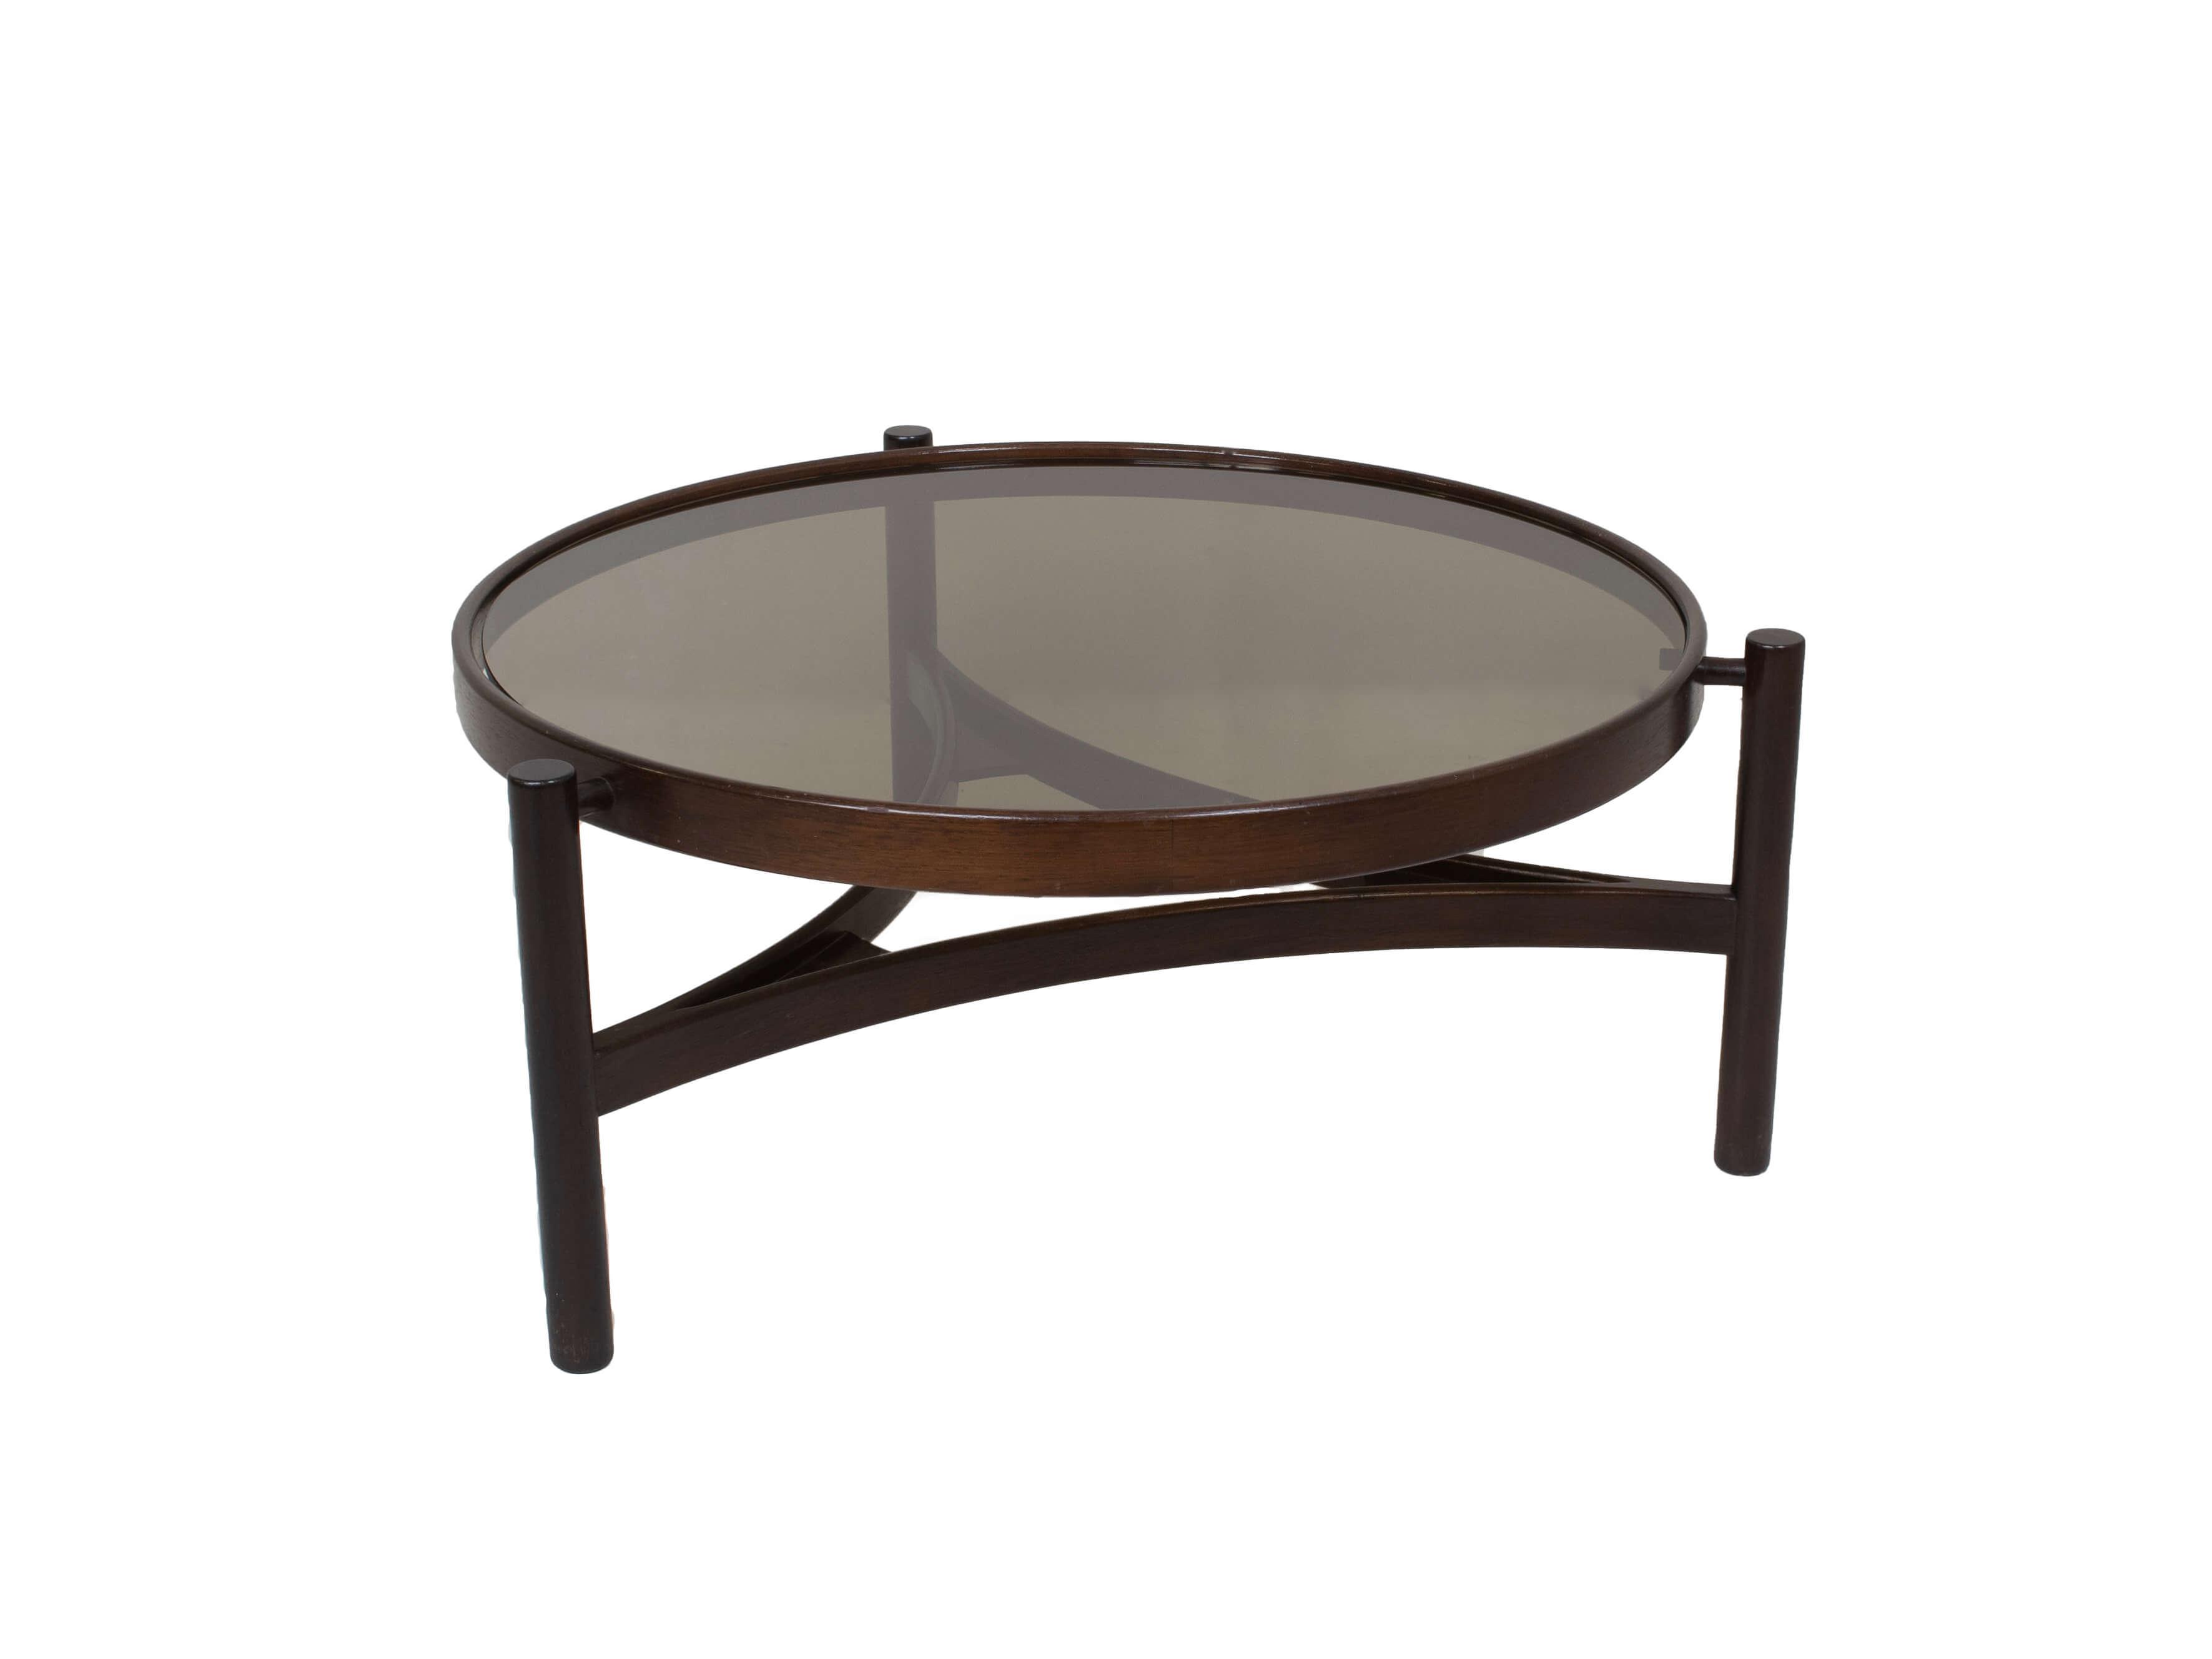 Round Italian Modern Coffee Table Model 775 by Gianfranco Frattini